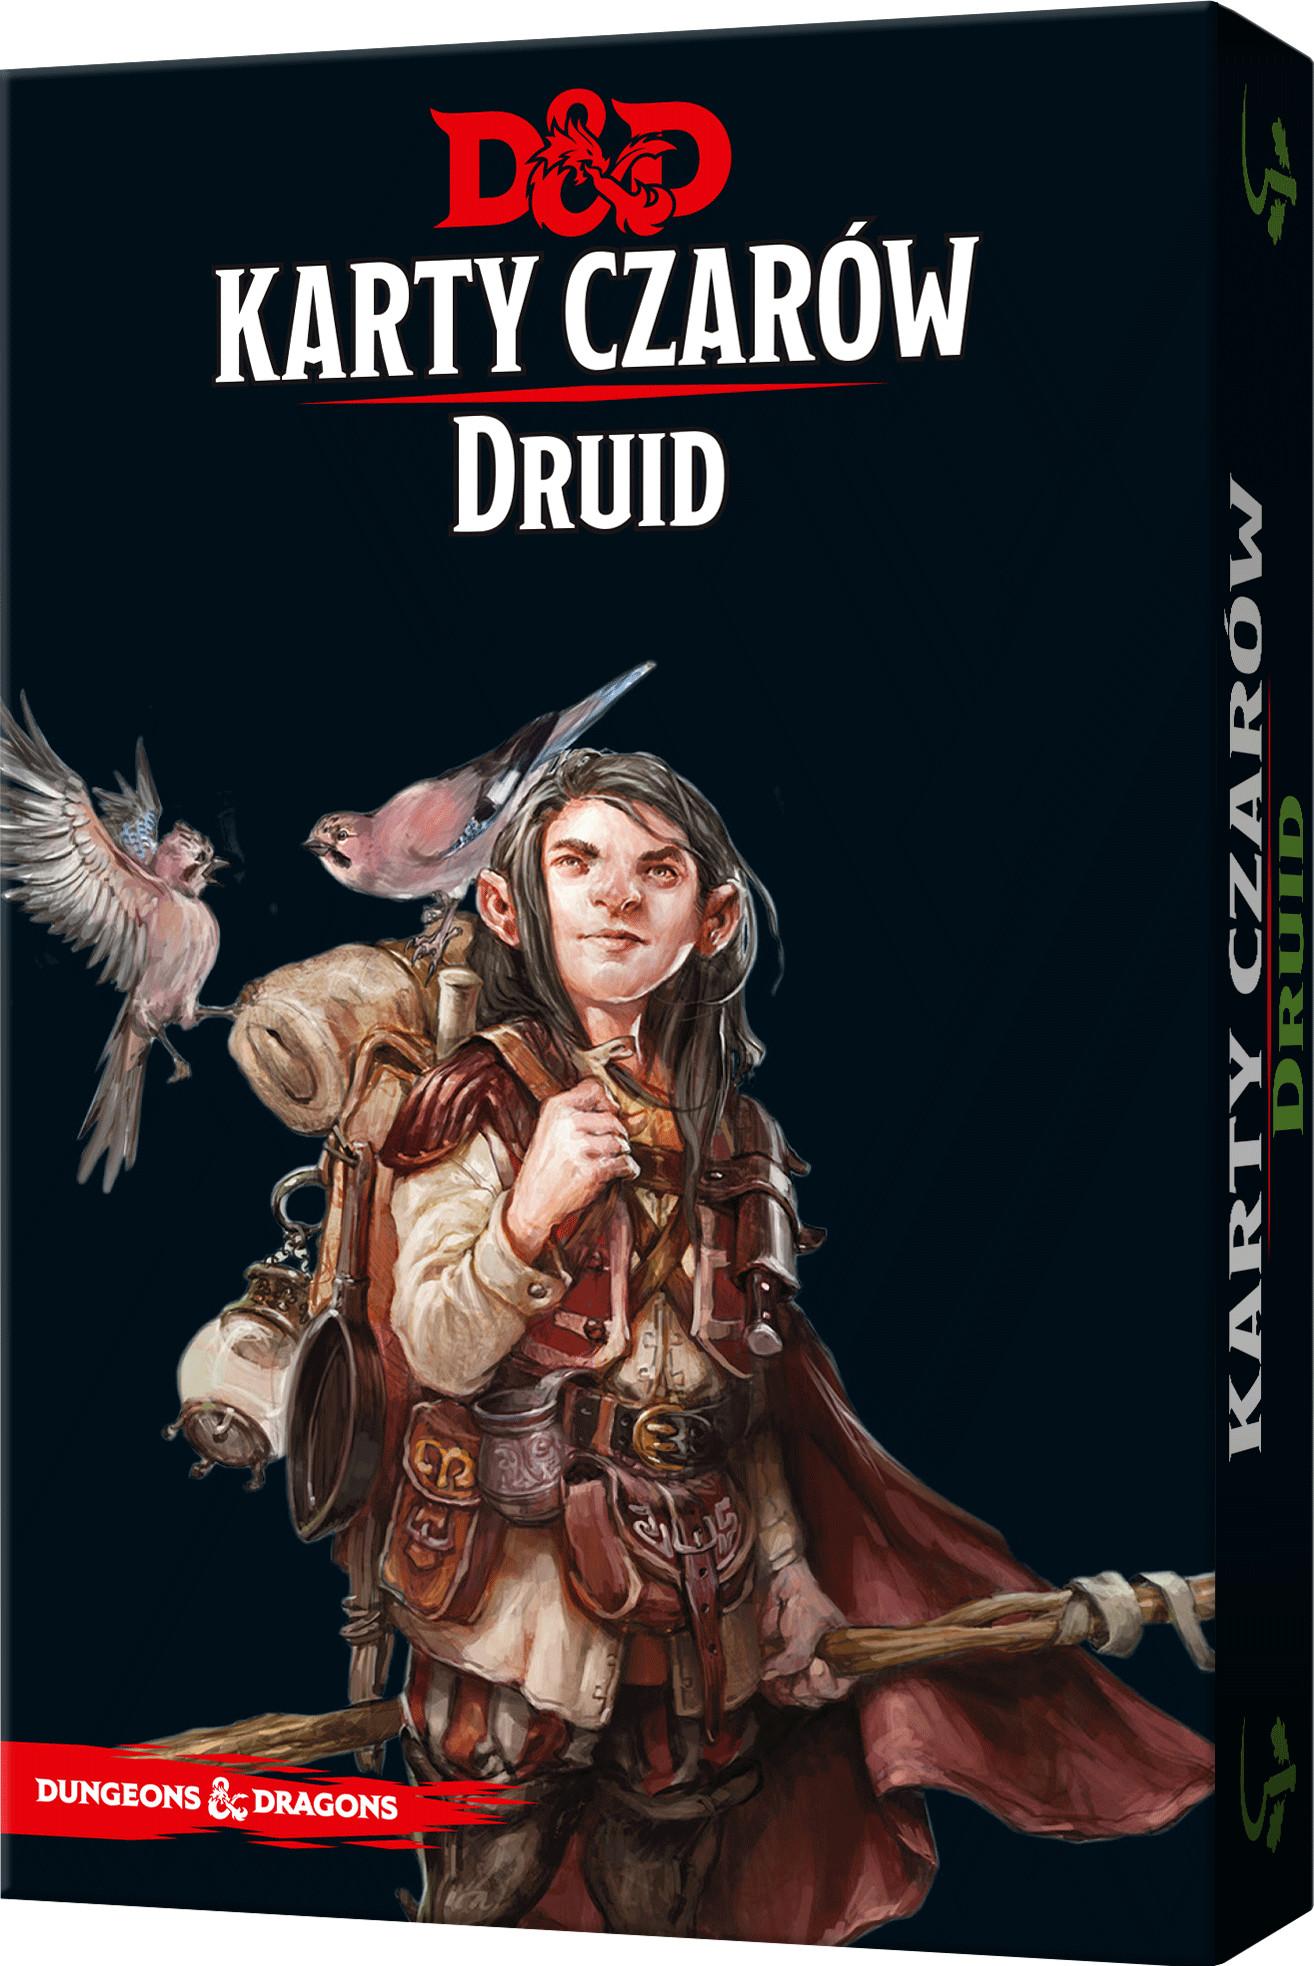 Rebel Dungeons & Dragons. Karty czarów, Druid